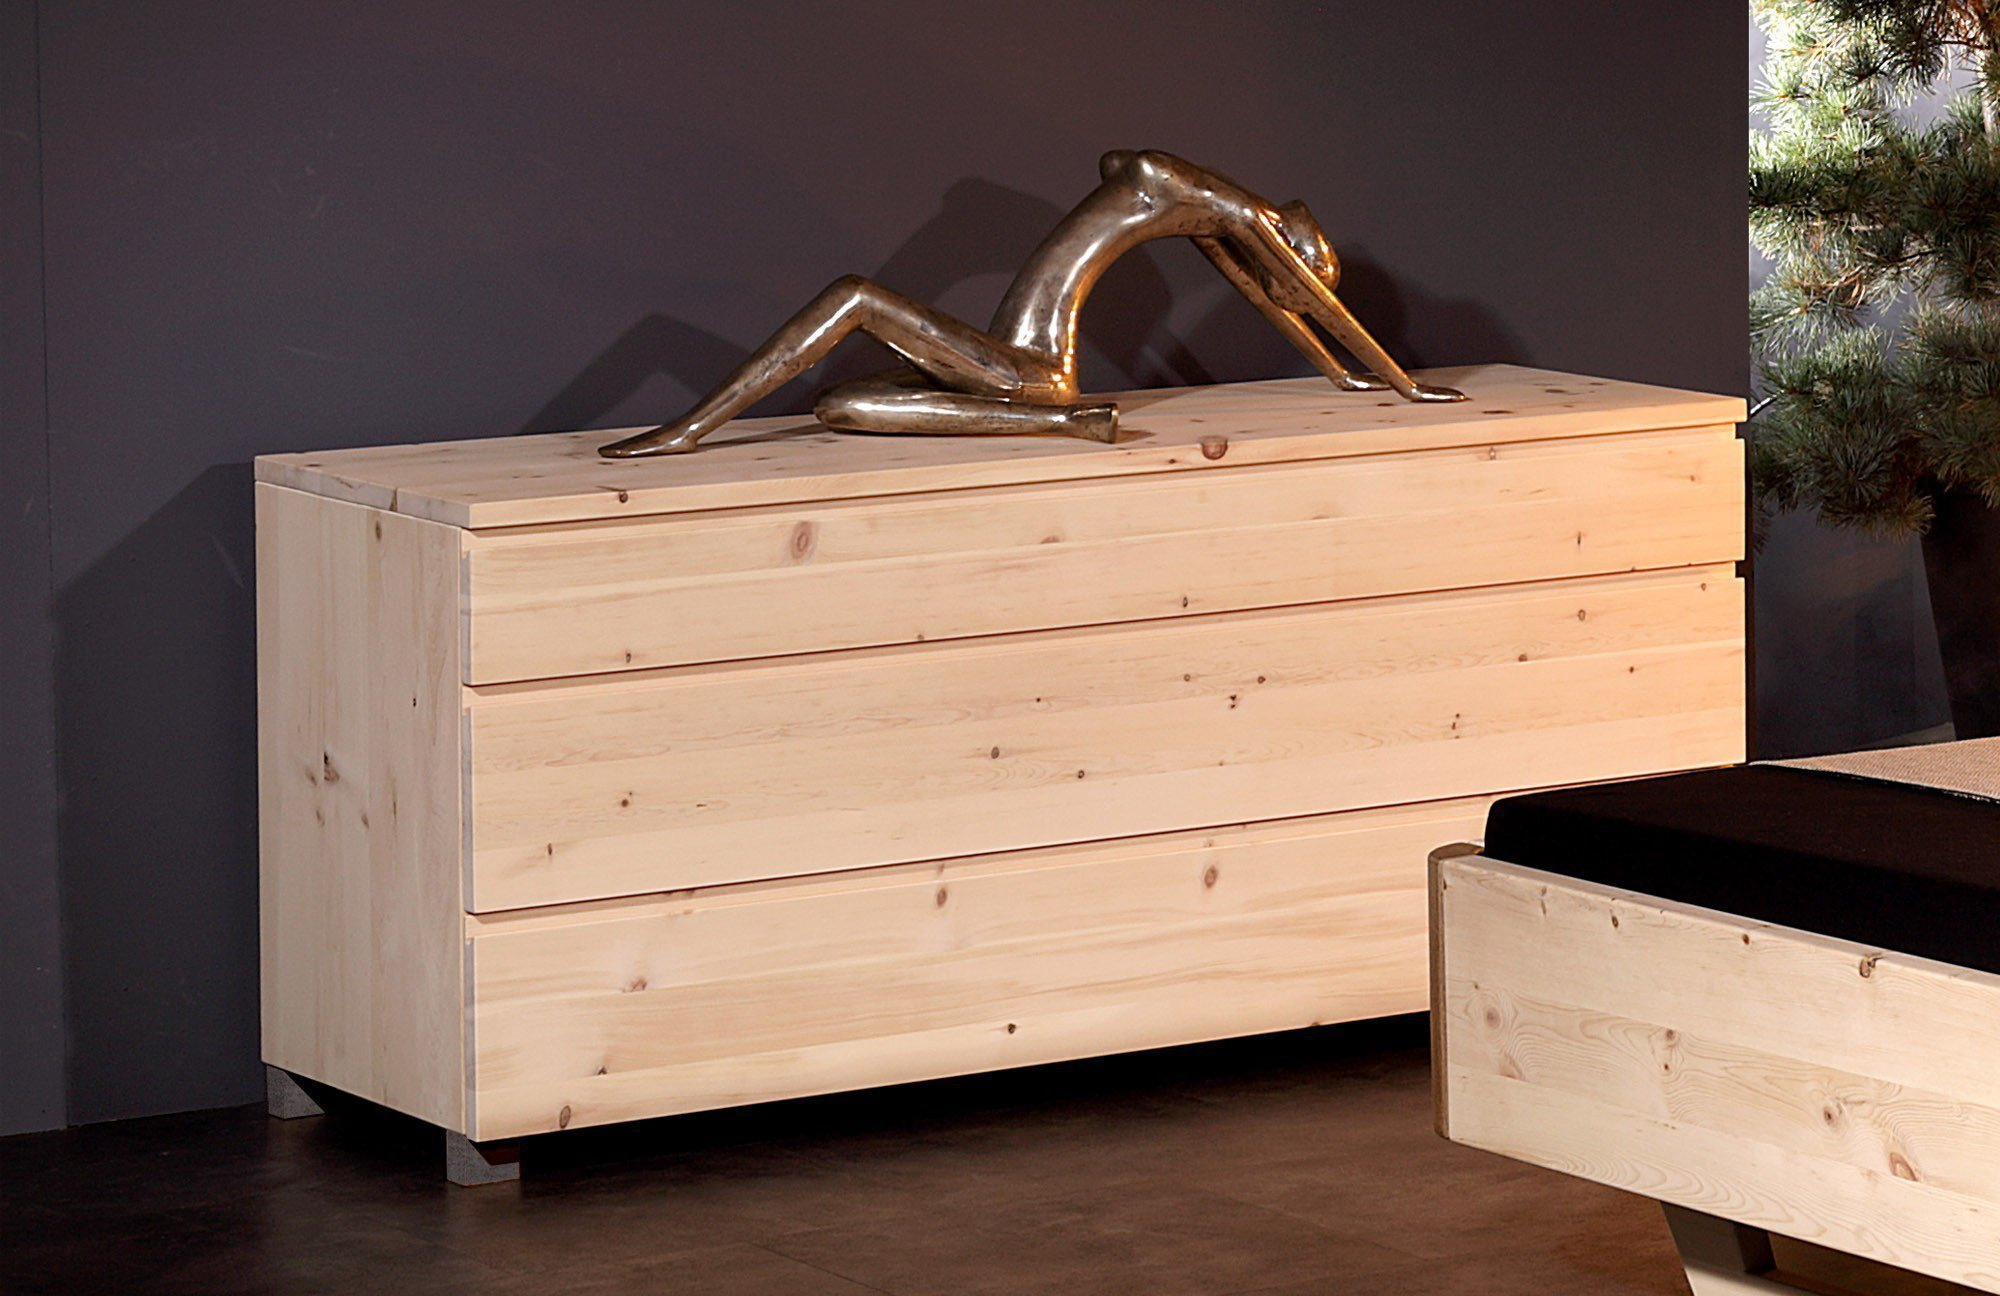 mbel rosenheim amazing mbel gebraucht kaufen rosenheim with mbel rosenheim wohnungen rosenheim. Black Bedroom Furniture Sets. Home Design Ideas